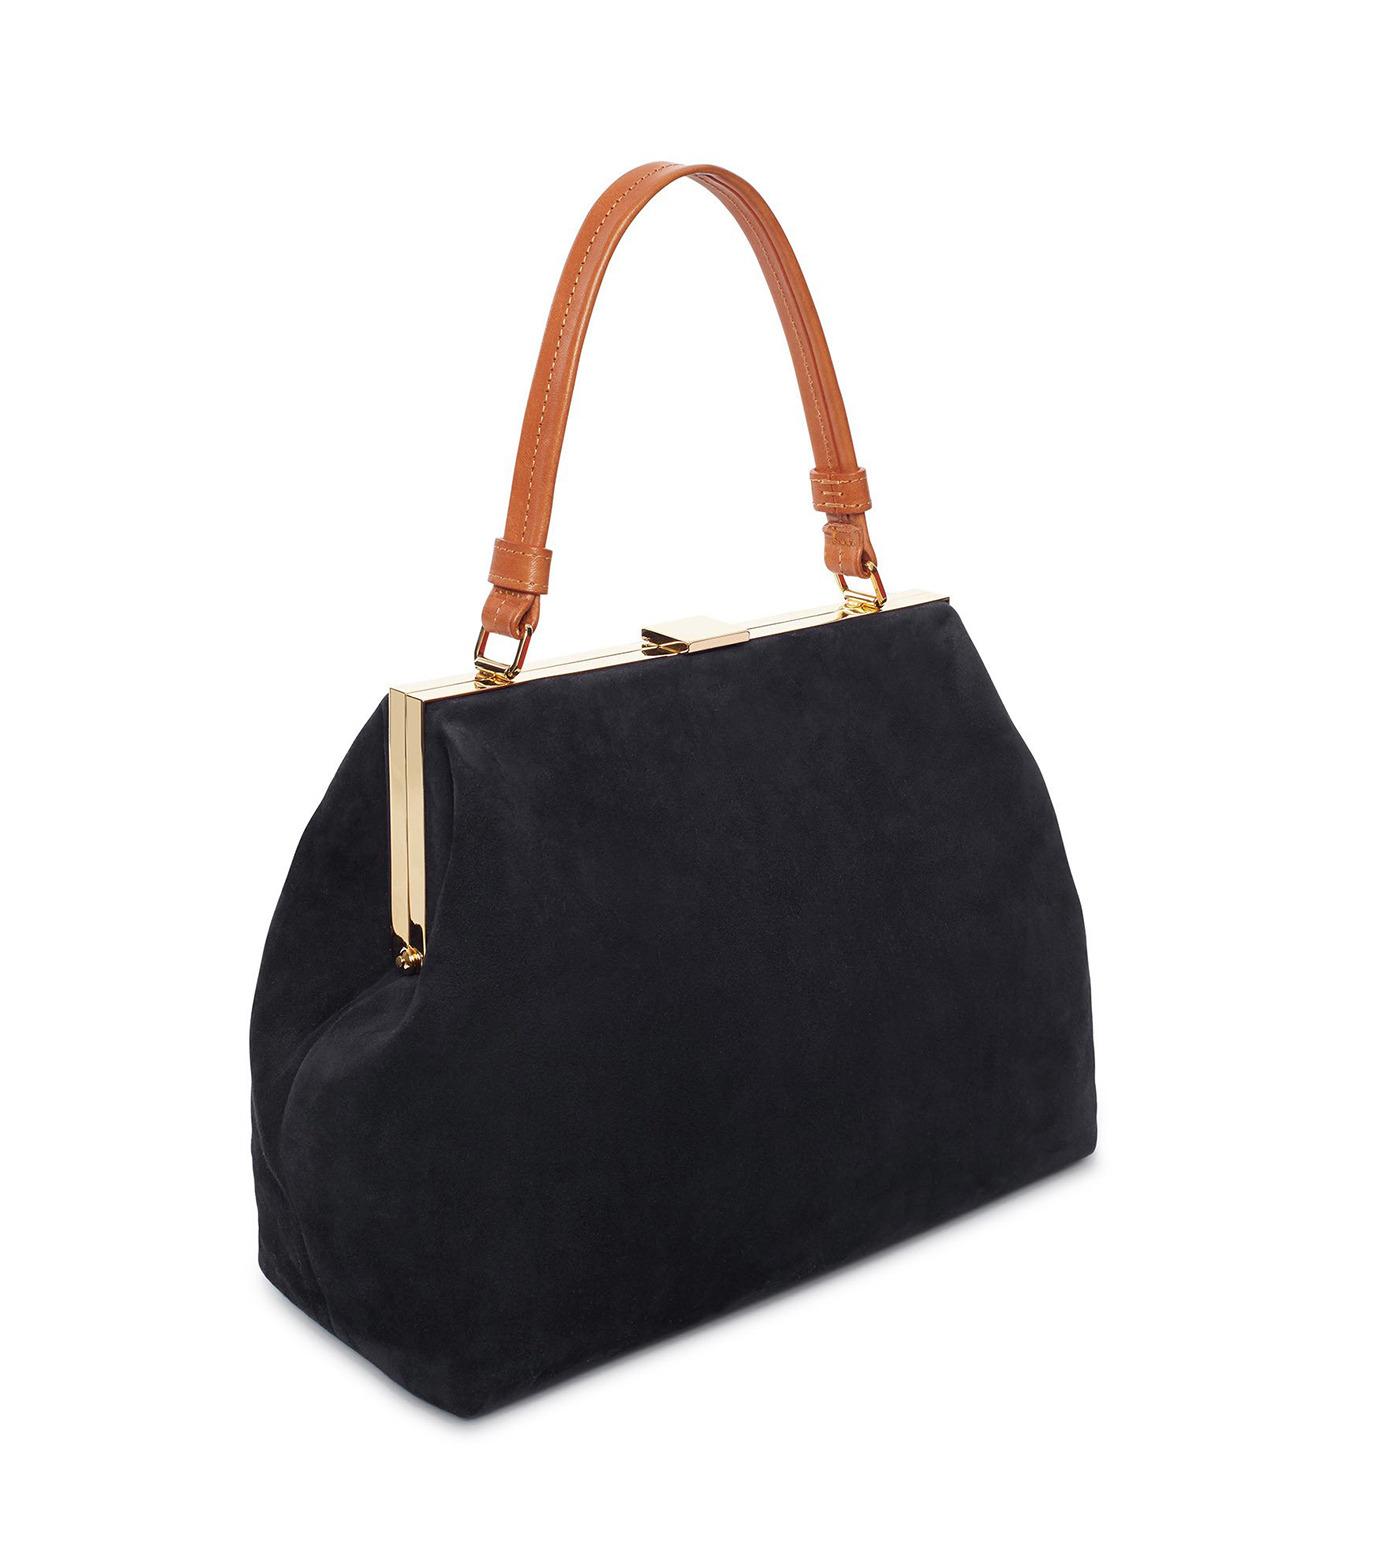 Mansur Gavriel(マンサーガブリエル)のsuede elegant bag-BLACK(ハンドバッグ/hand bag)-HEB024SU-13 拡大詳細画像2